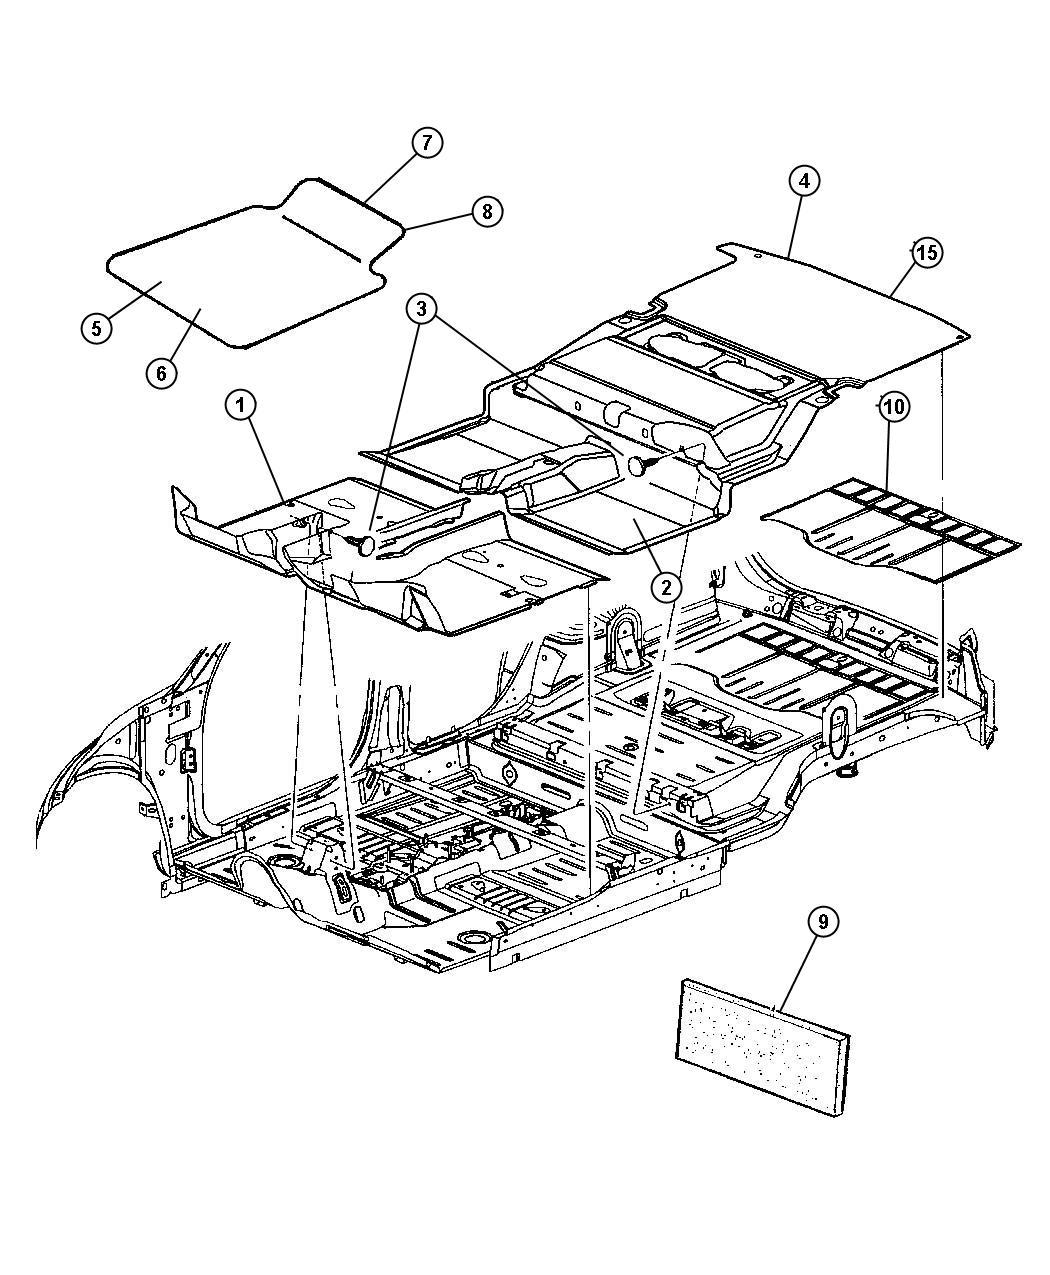 Chrysler Pt Cruiser Mat. Floor. Trim: [all trim codes